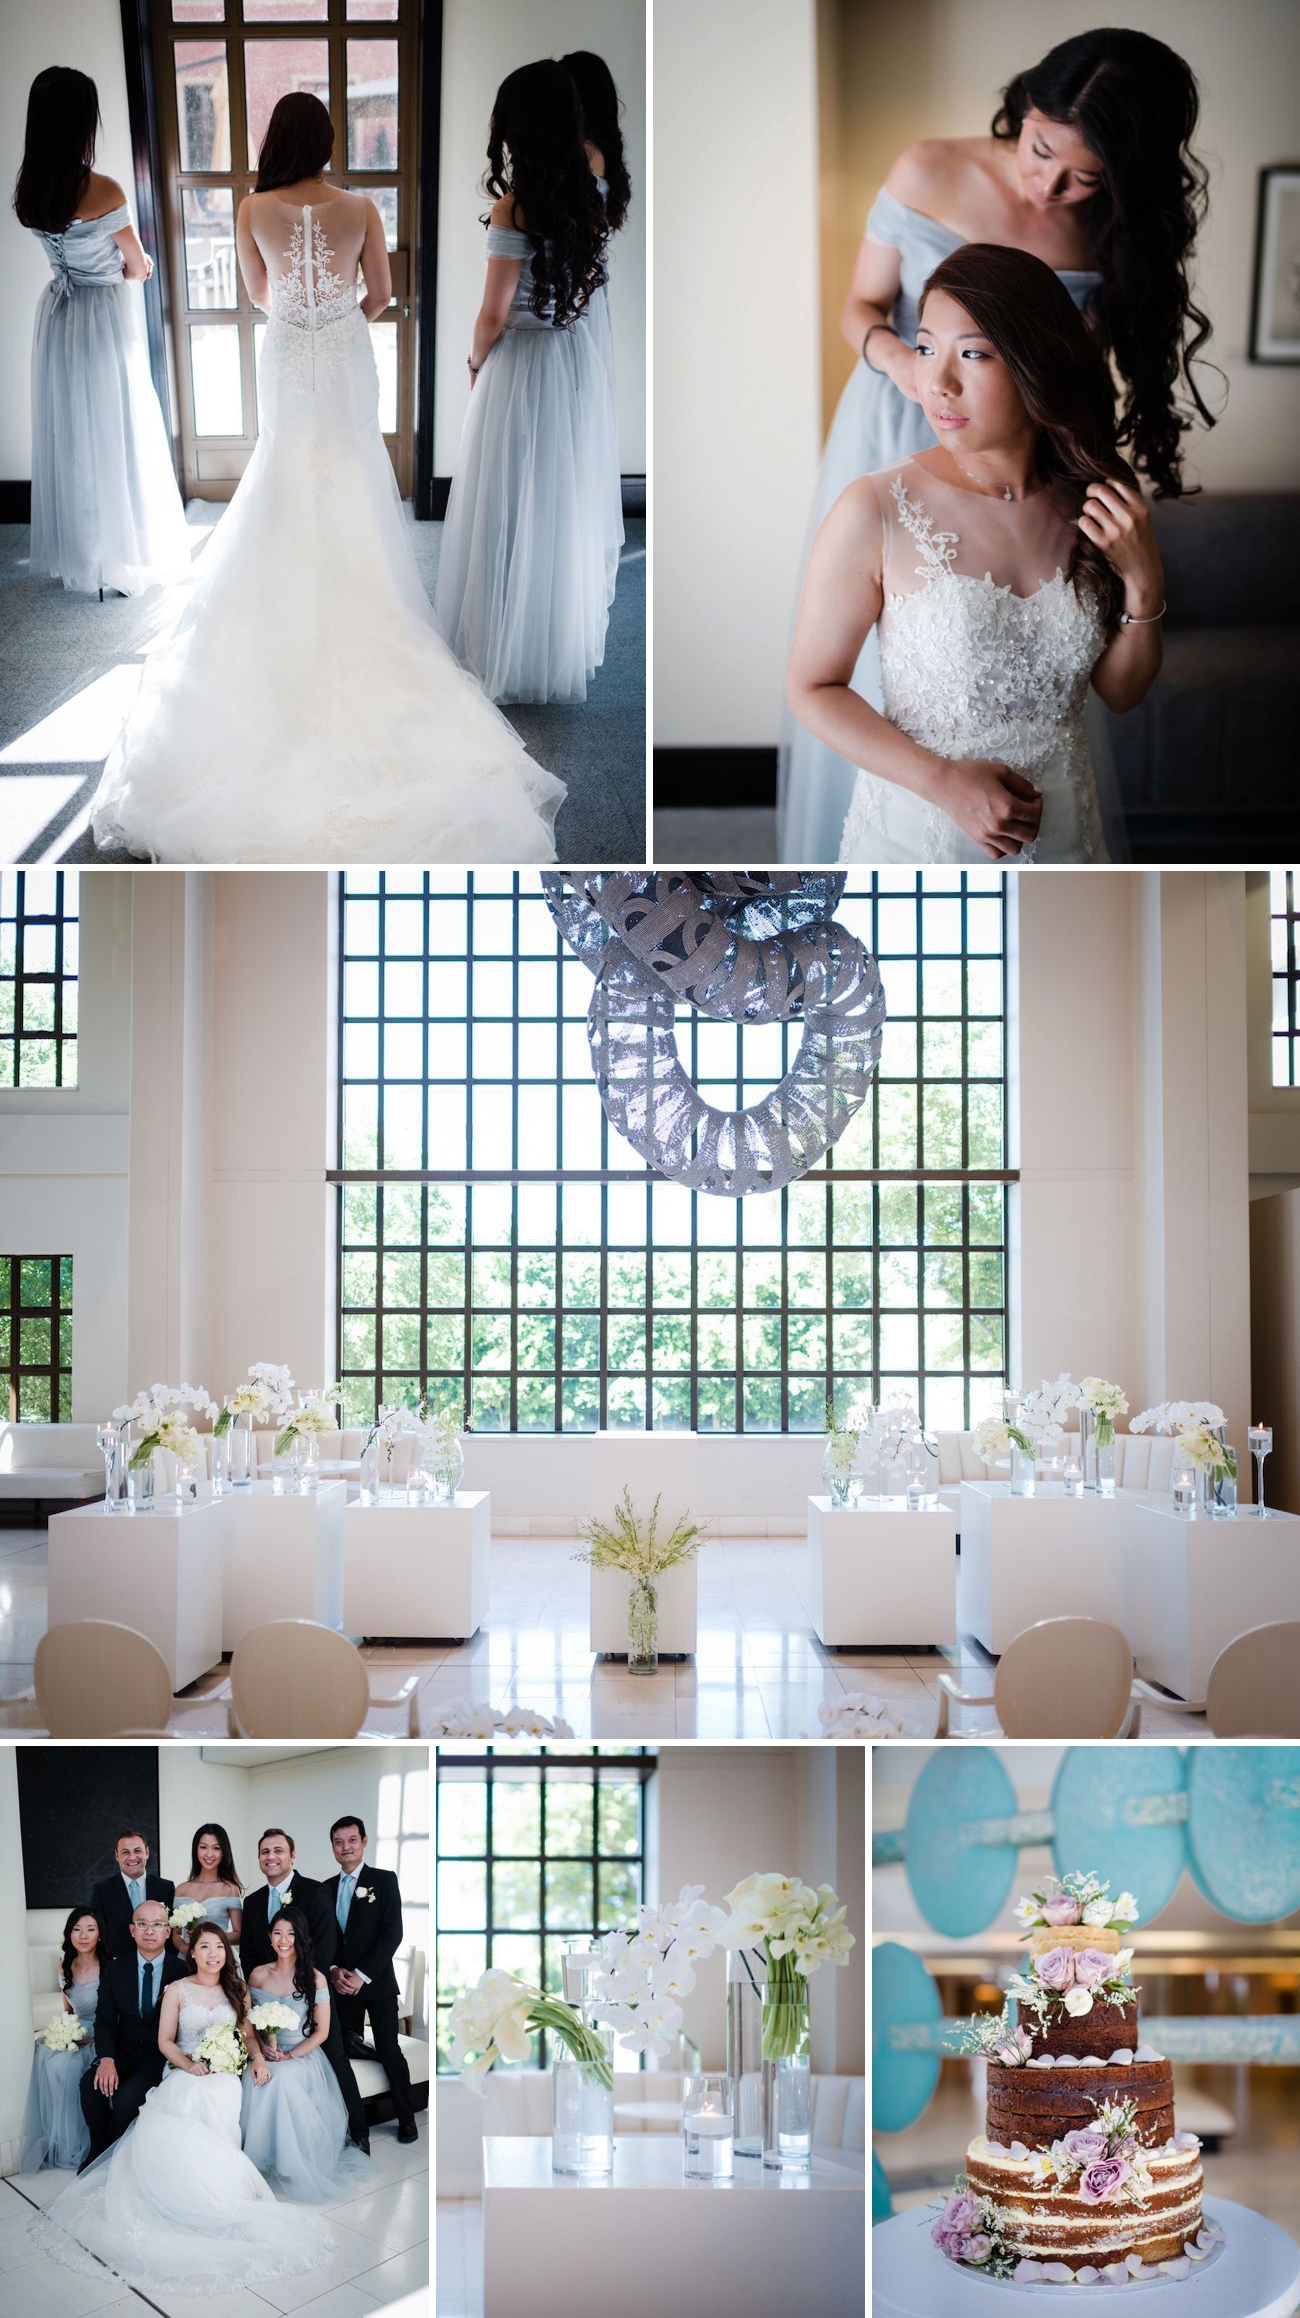 Elegant Modern Asian Wedding at The Forum | The Campus by Wynand van ...